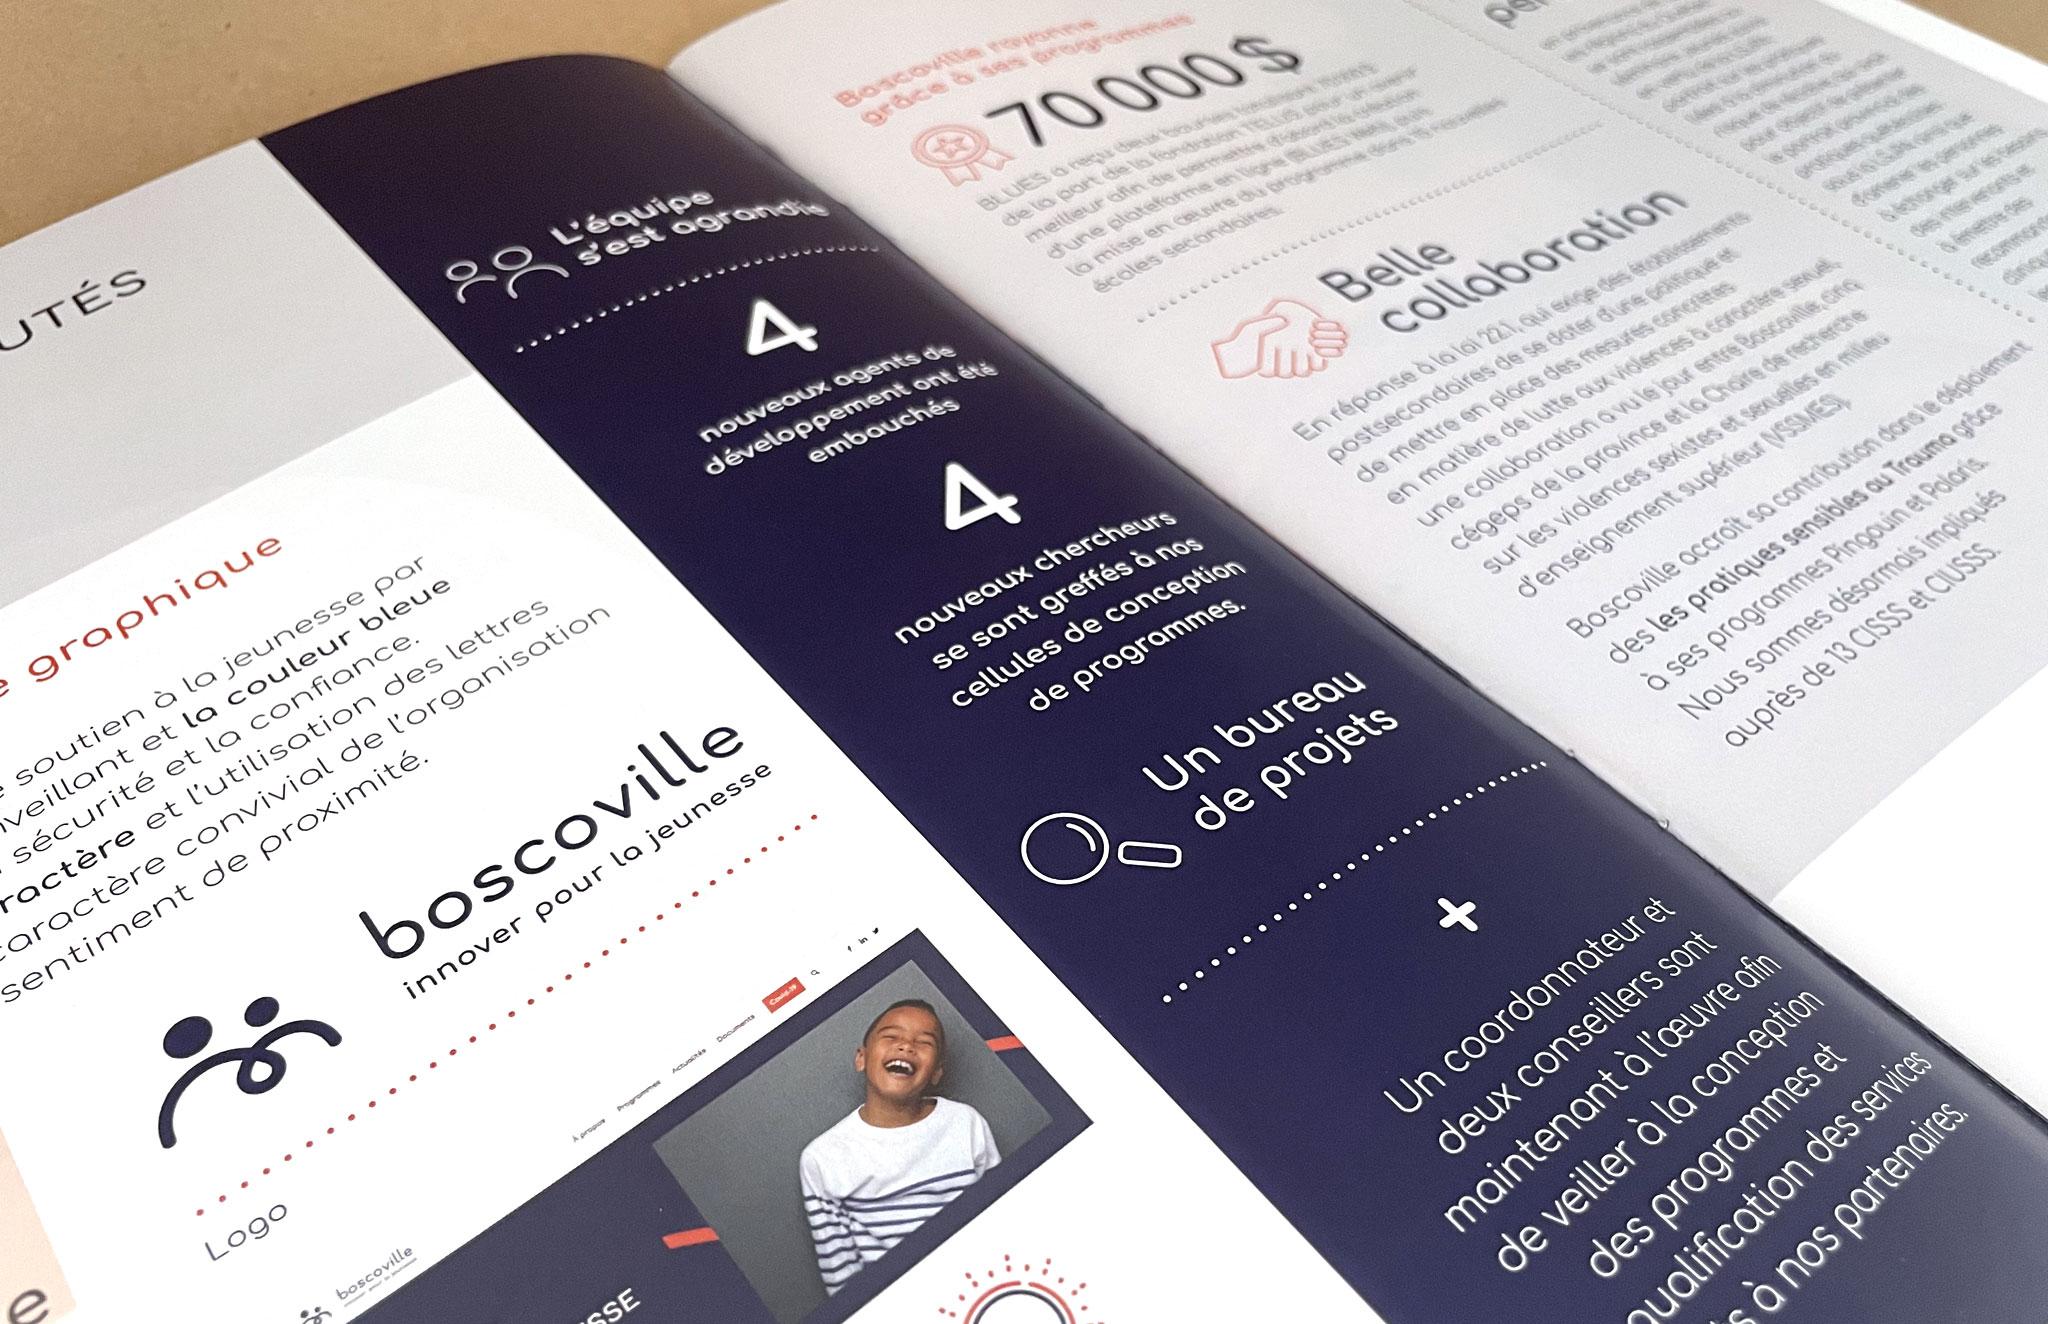 Rapport annuel de Boscoville.